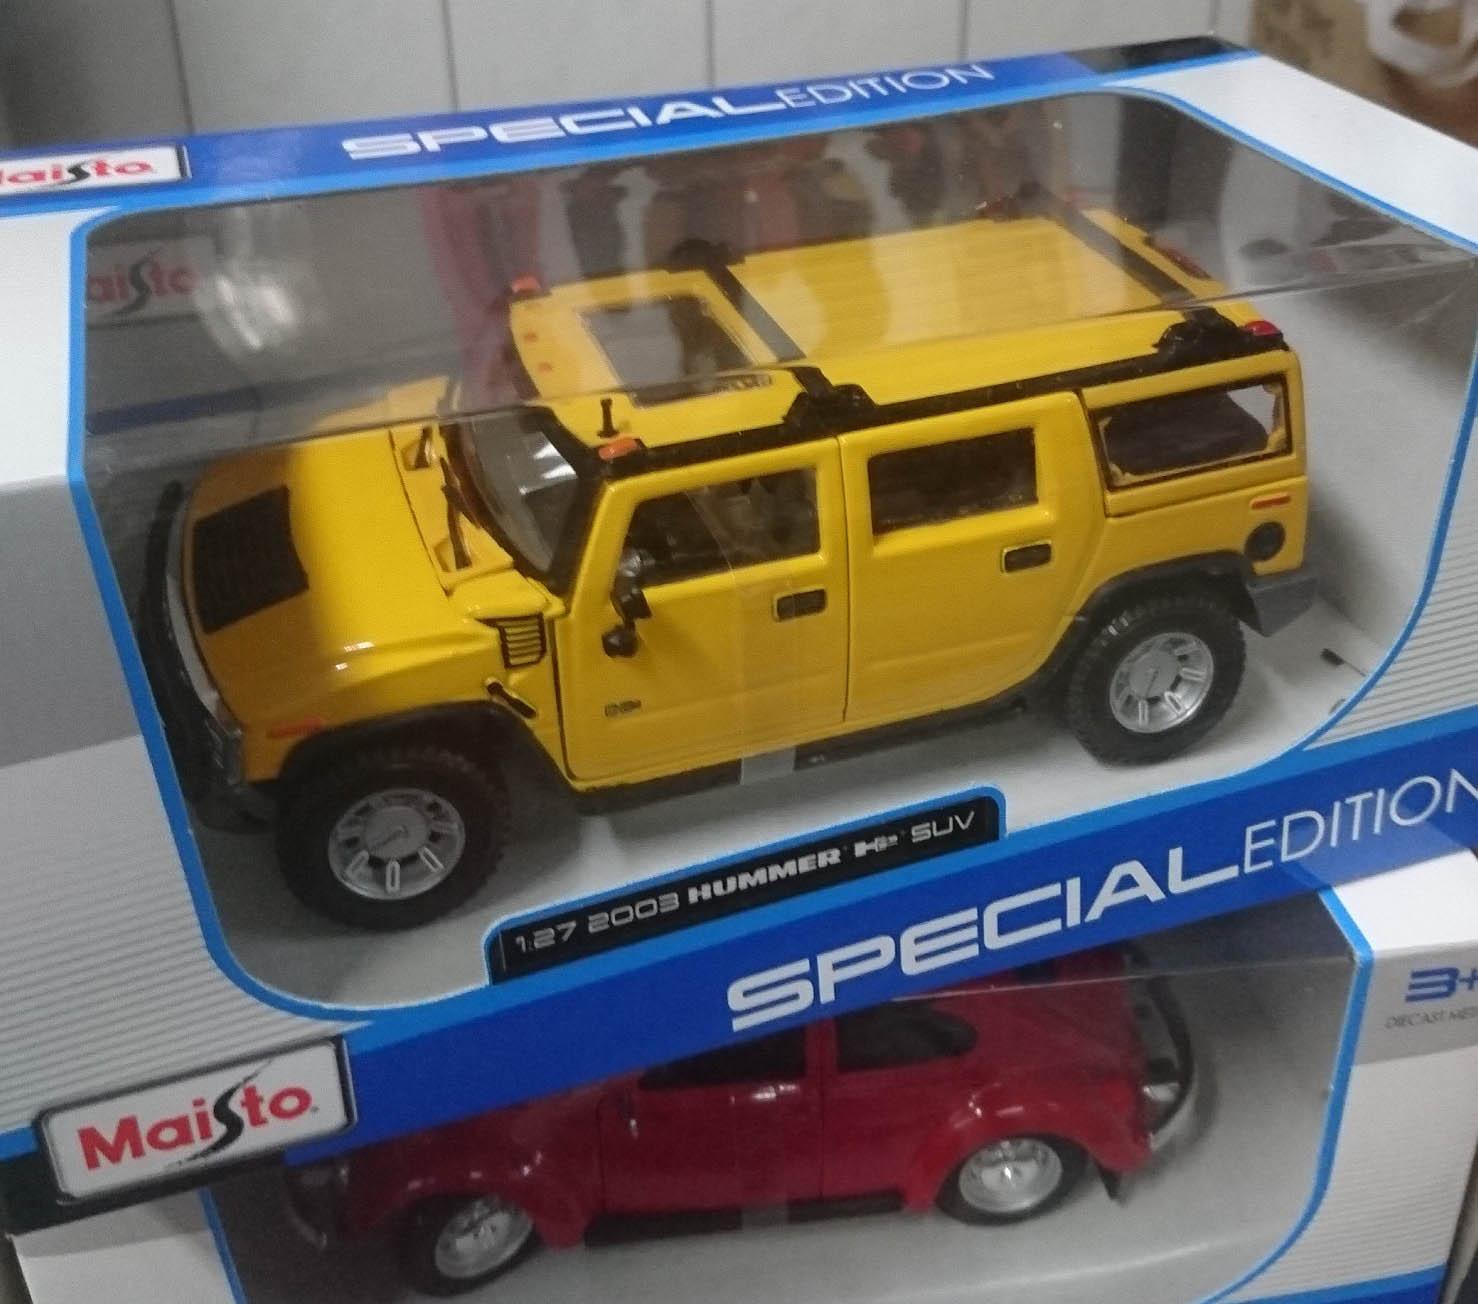 Maisto 1:27 2003 HUMMER H2 SUV 合金車,益祥模型玩具外盒實際拍攝照片。